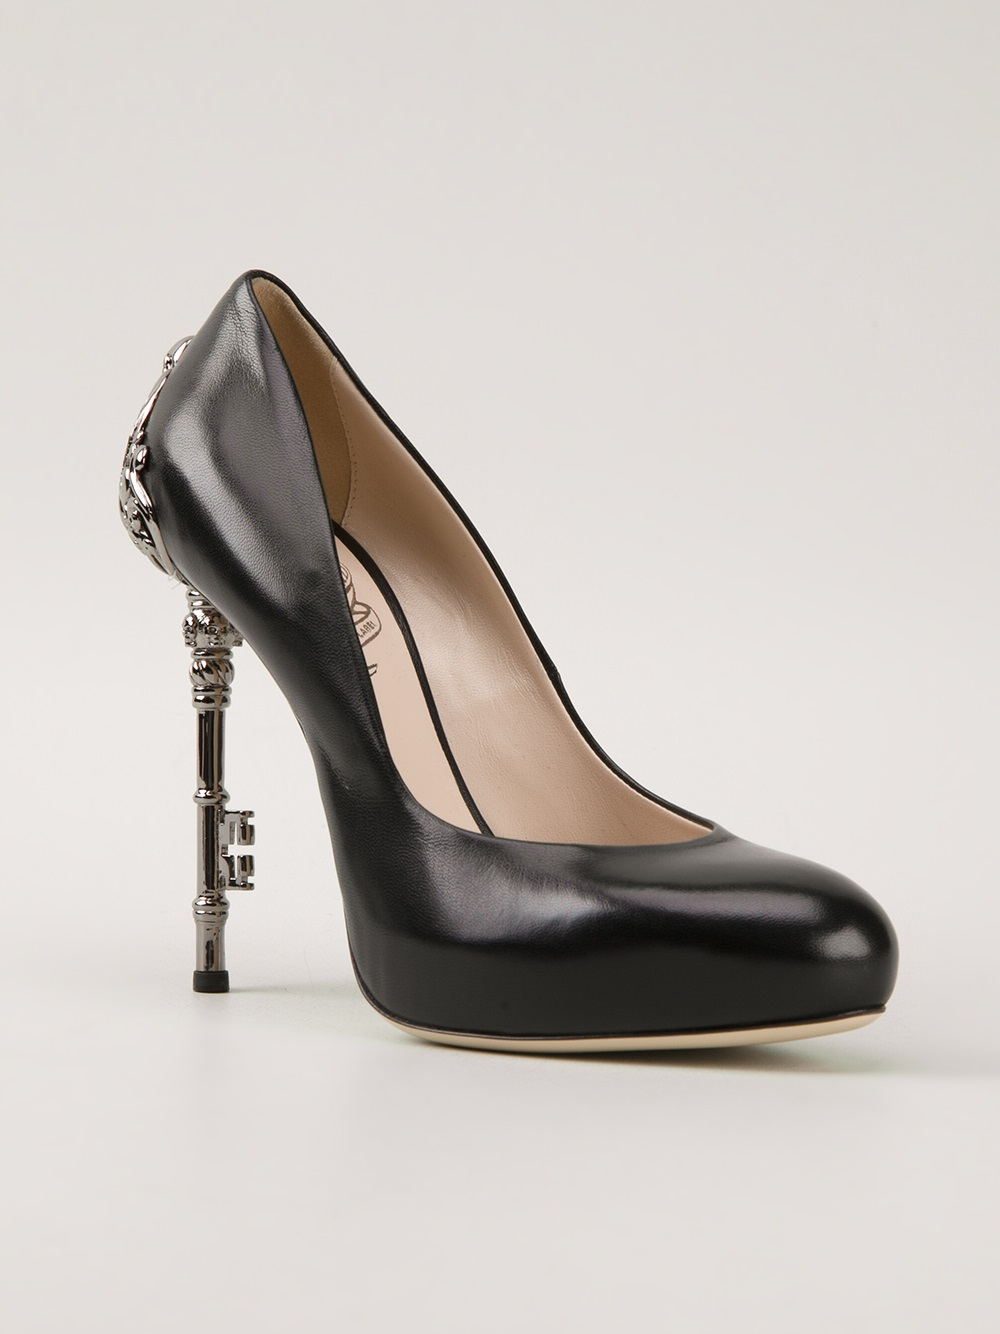 342c879e60b9 John richmond black label black embellished heel pump product normal jpg  1000x1334 John richmond black label